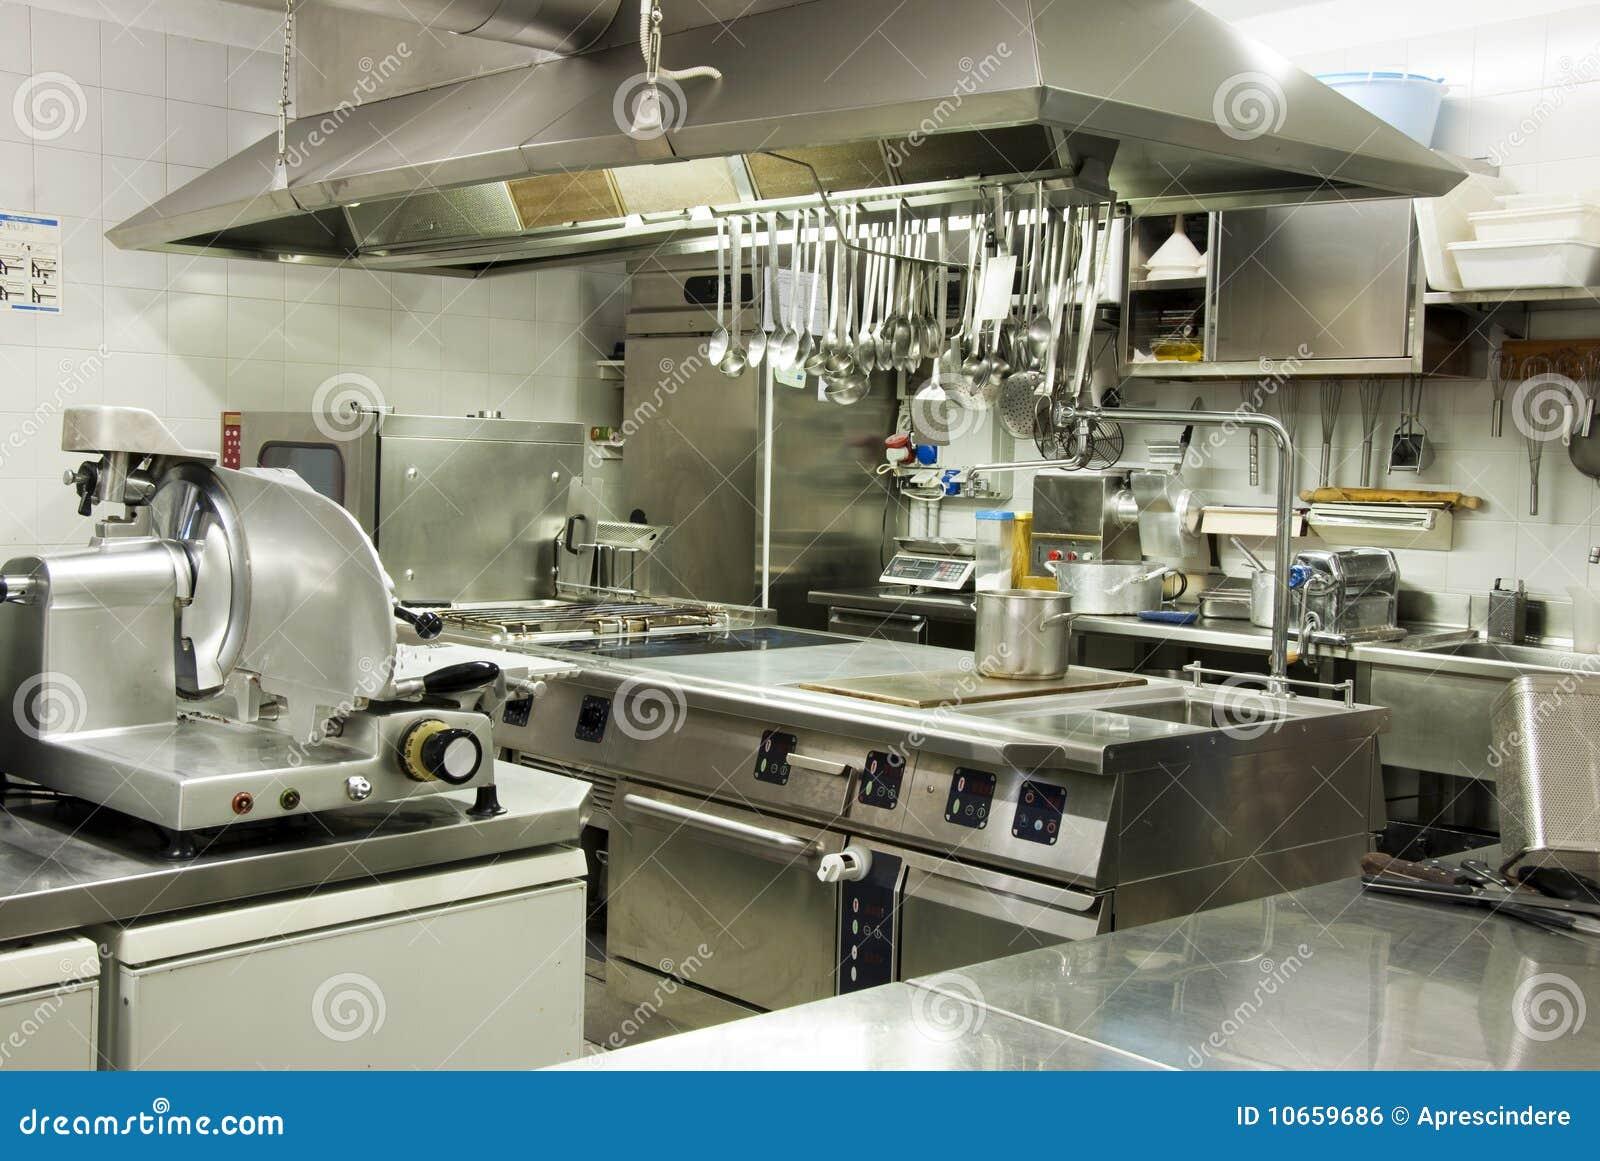 Restaurant Equipment Kitchener